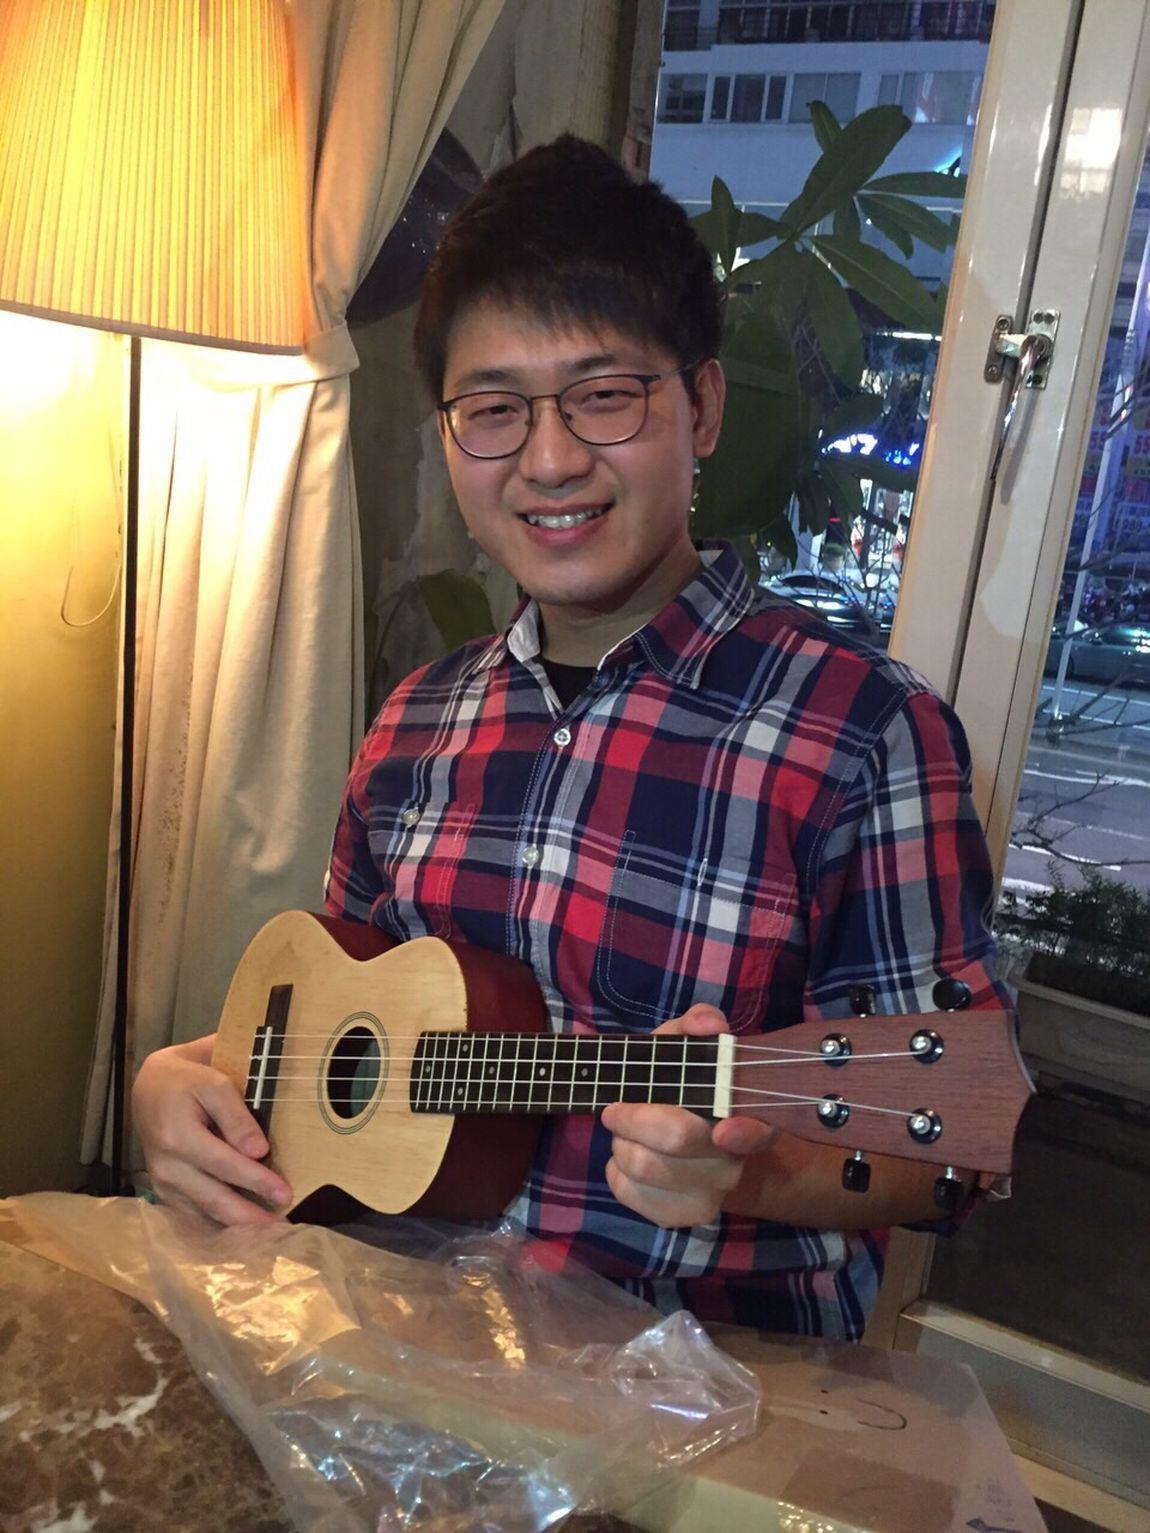 Happy Birthday! 生日快樂 高雄 聚會 晚餐 Dinner 咖啡廳 臺灣 Taiwanese Taiwan February Kaohsiung 二月